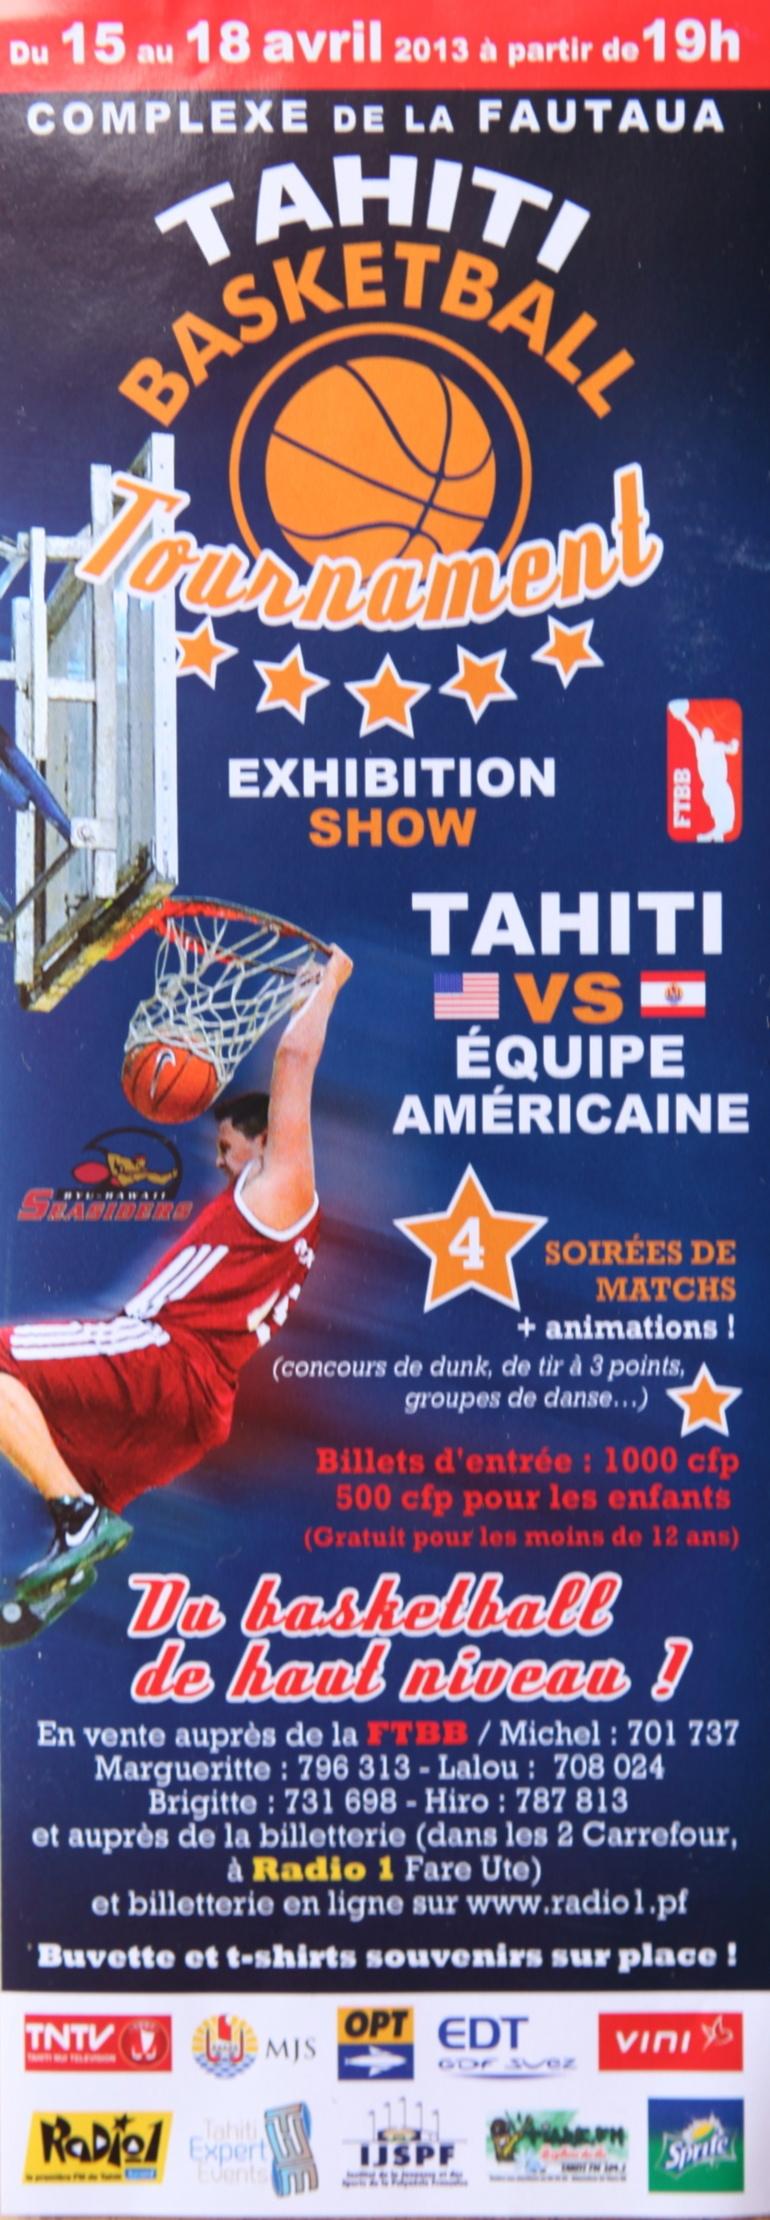 Basket Ball : Tahiti affrontera une Equipe américaine à Fautaua